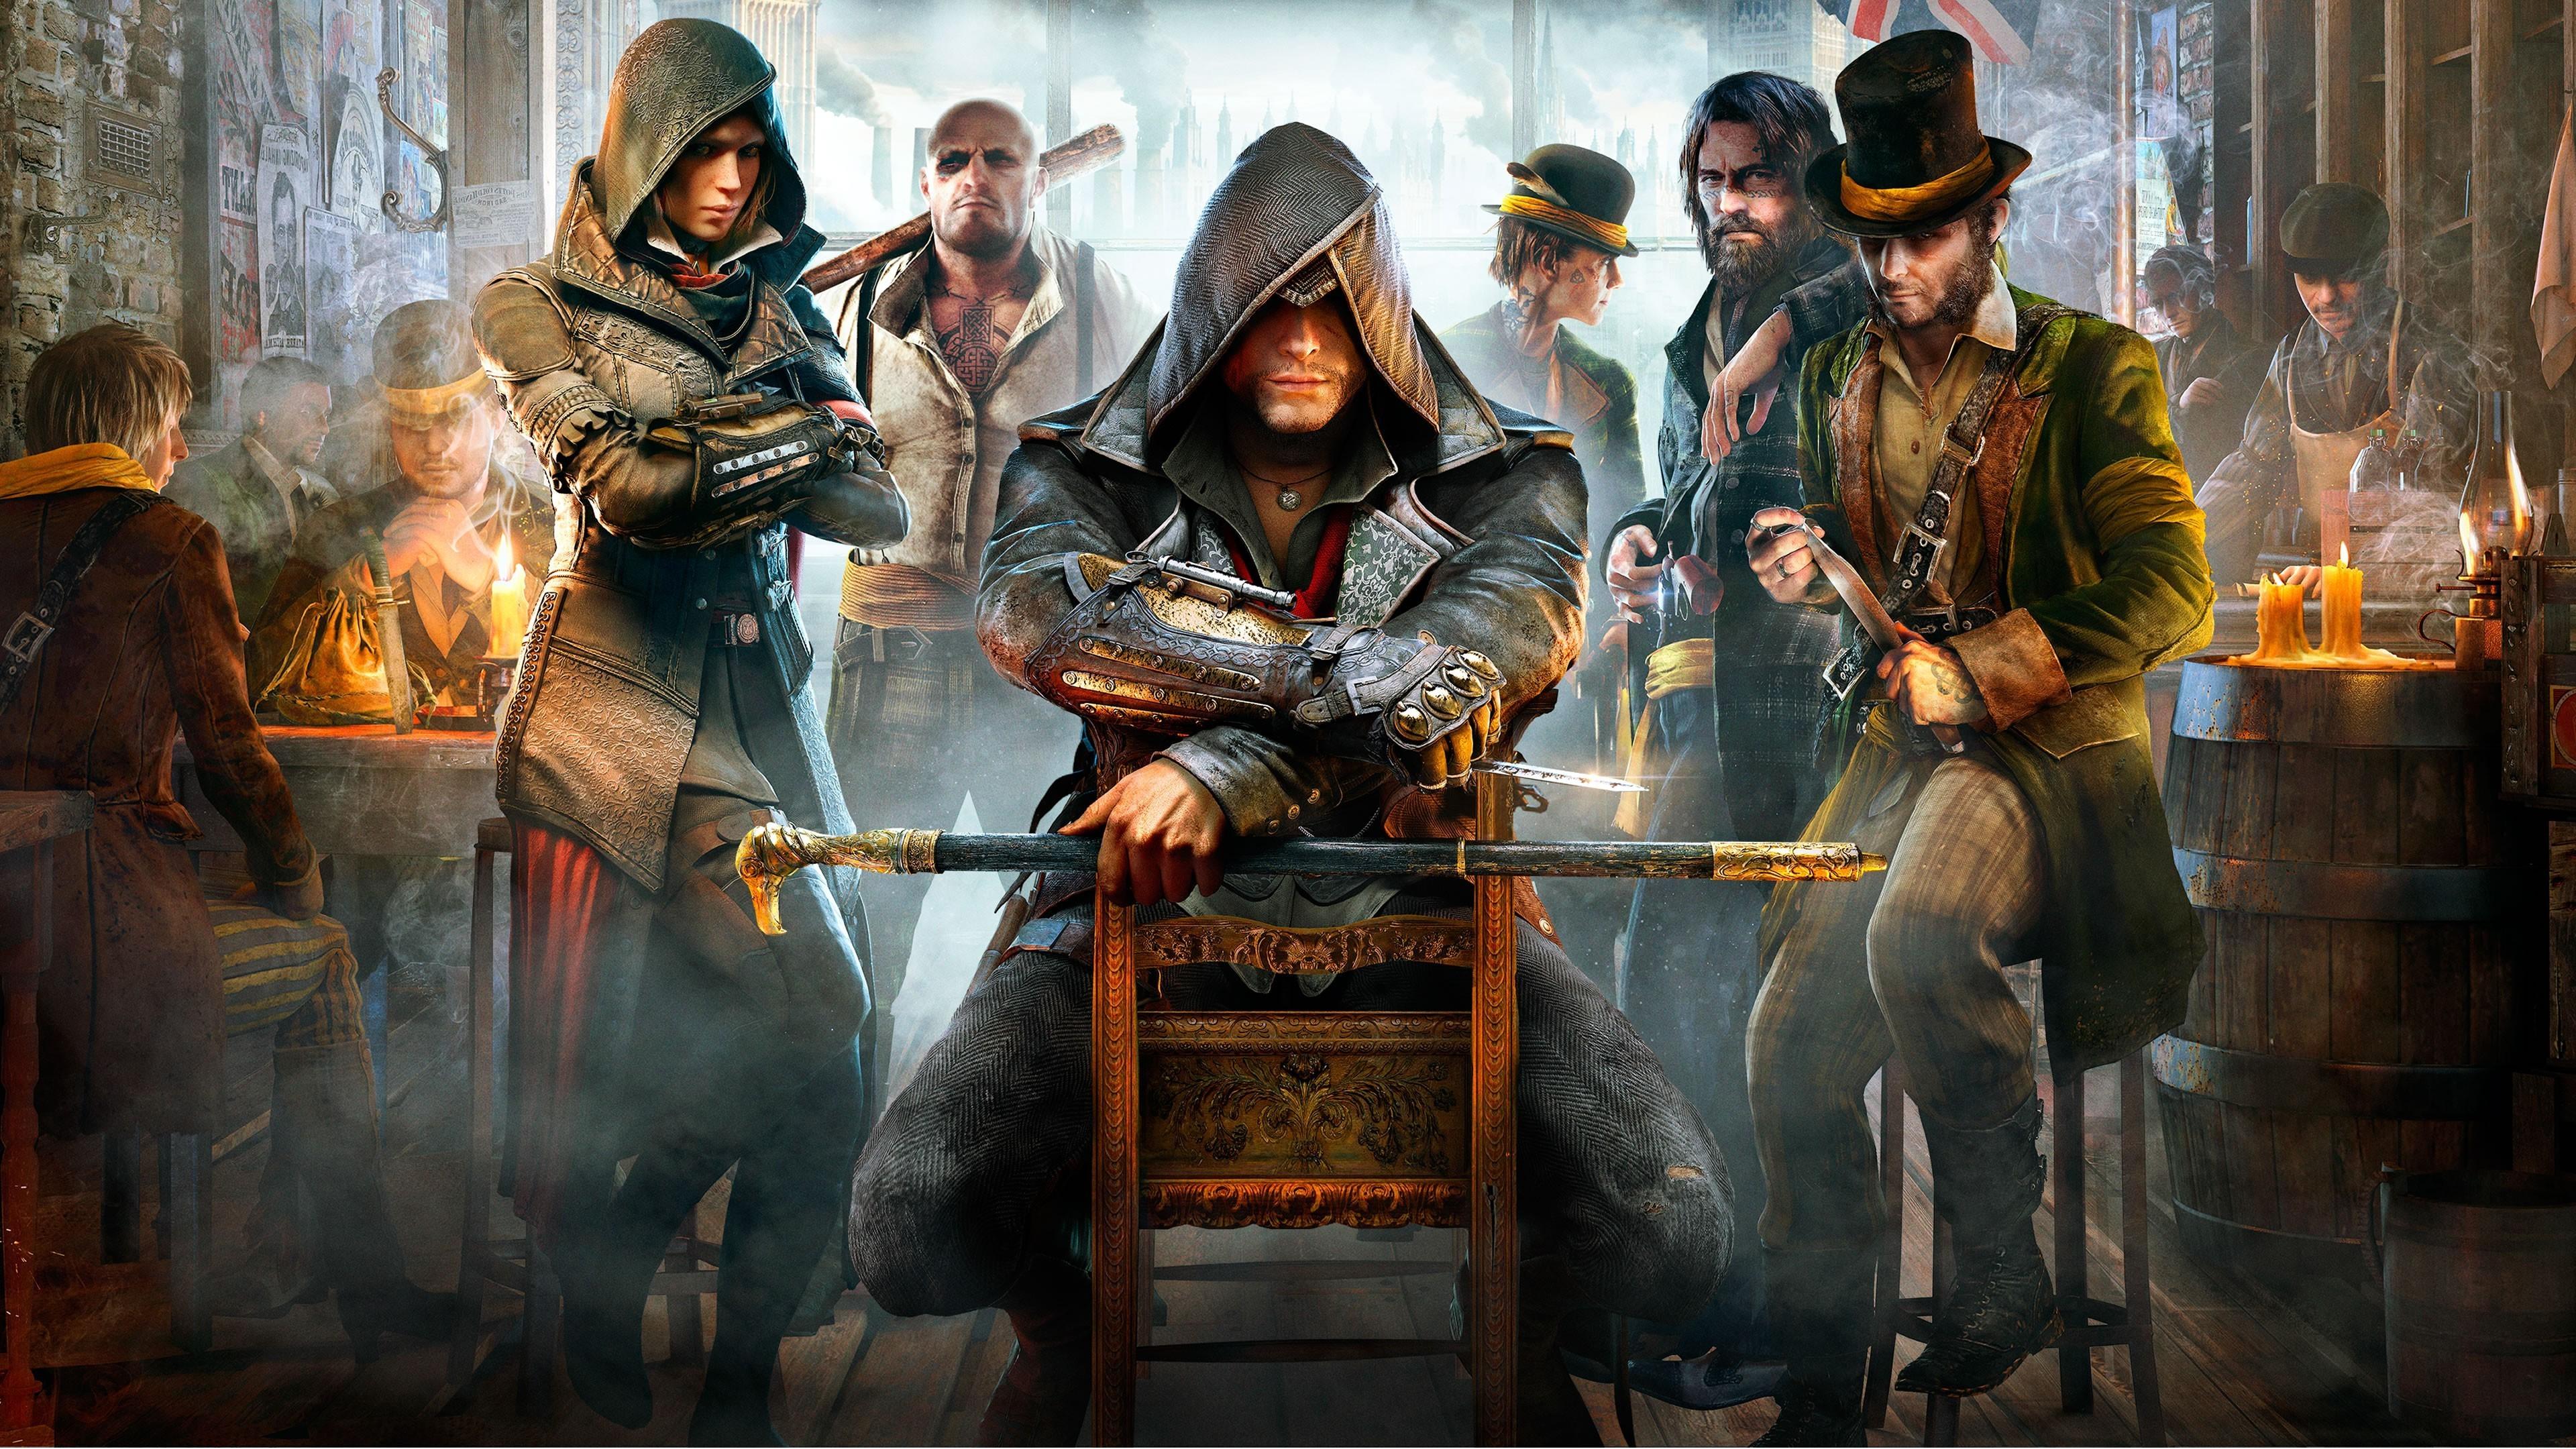 assassins creed 2 1535966604 - Assassins Creed 2 - xbox games wallpapers, ps games wallpapers, pc games wallpapers, games wallpapers, assassins creed wallpapers